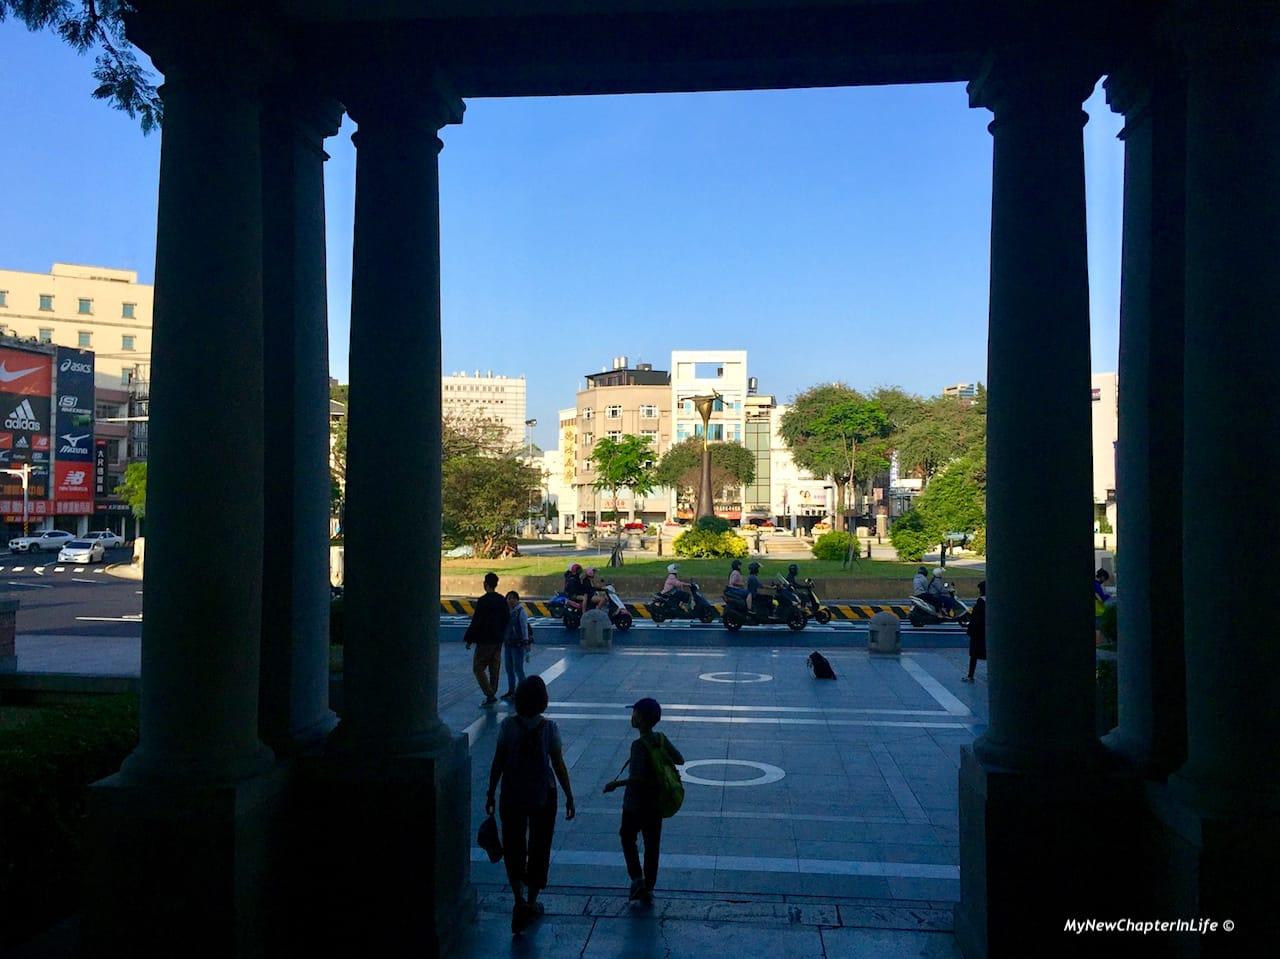 館外的湯德章紀念公園 Tangdezhang Memorial Park